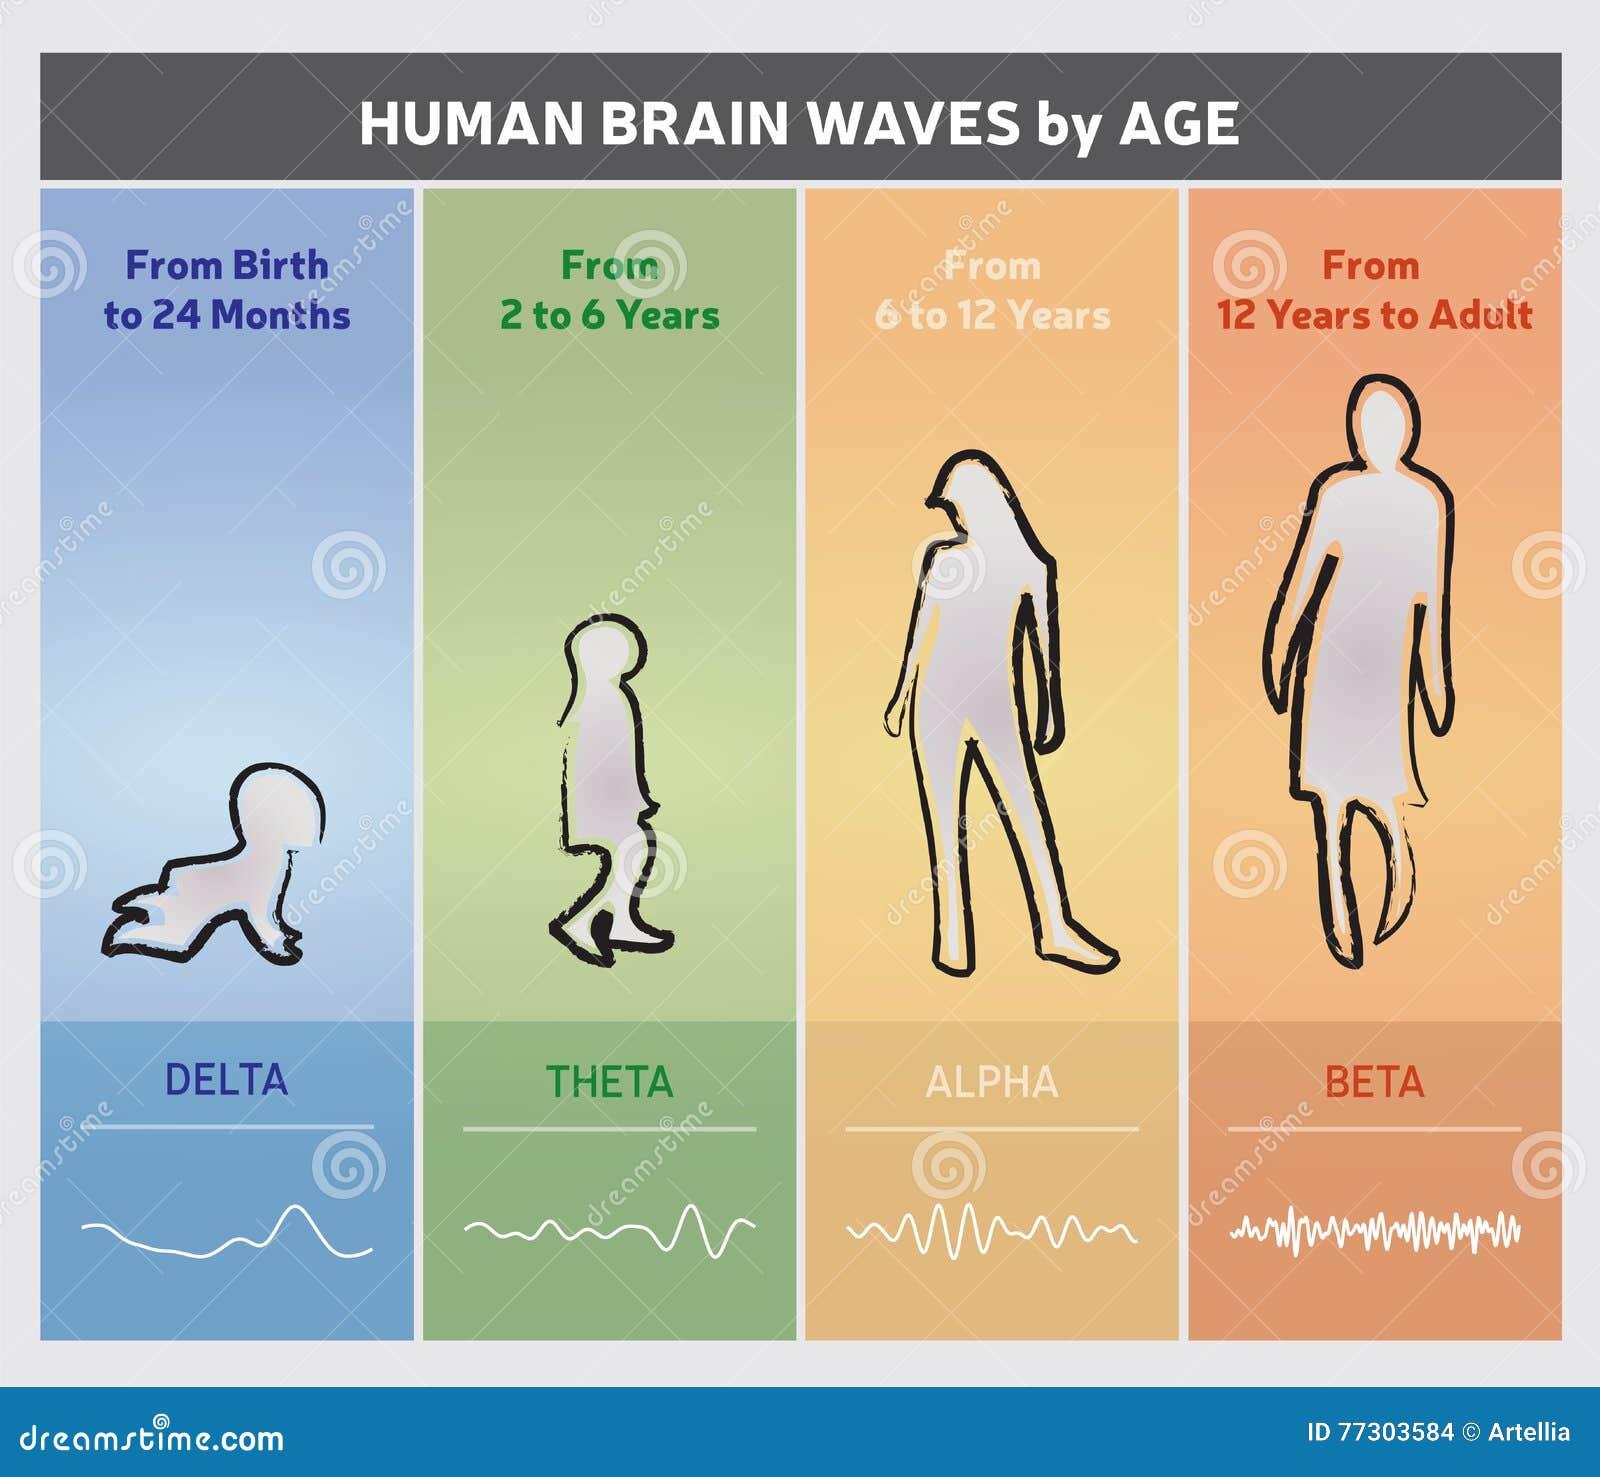 Brain Delta Waves Stock Illustrations – 16 Brain Delta Waves Stock